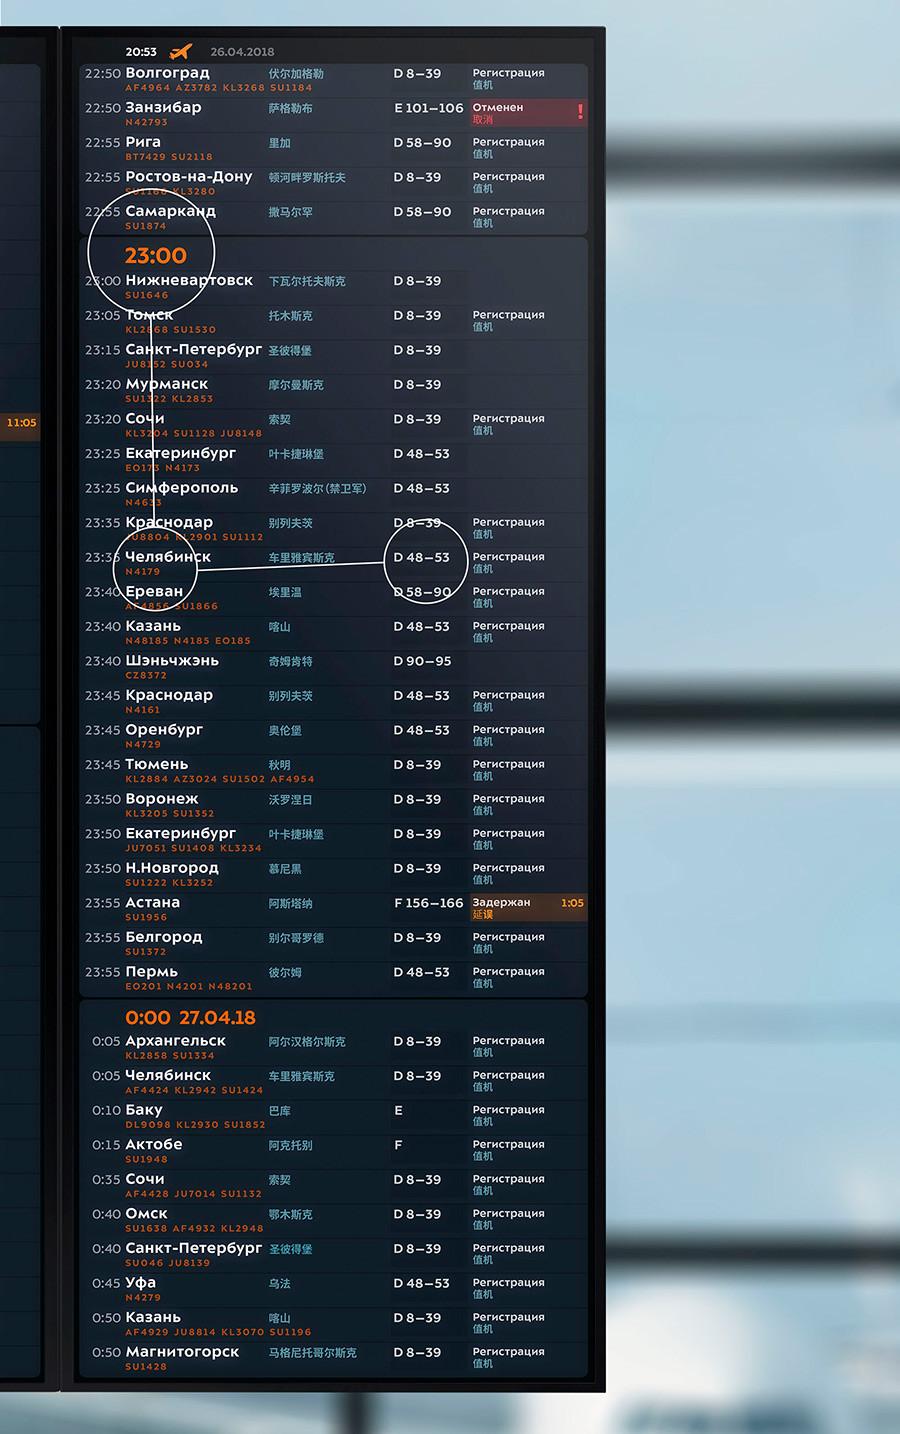 Flights hour | Skooldio Blog - จบปัญหาดู Flight ยาก! หา Gate ไม่เจอ! เคสจริงการปรับ 4  ดีไซน์ง่ายๆ ของสนามบินใหญ่ที่สุดในรัสเซีย ที่ทำให้นักท่องเที่ยวปลื้ม